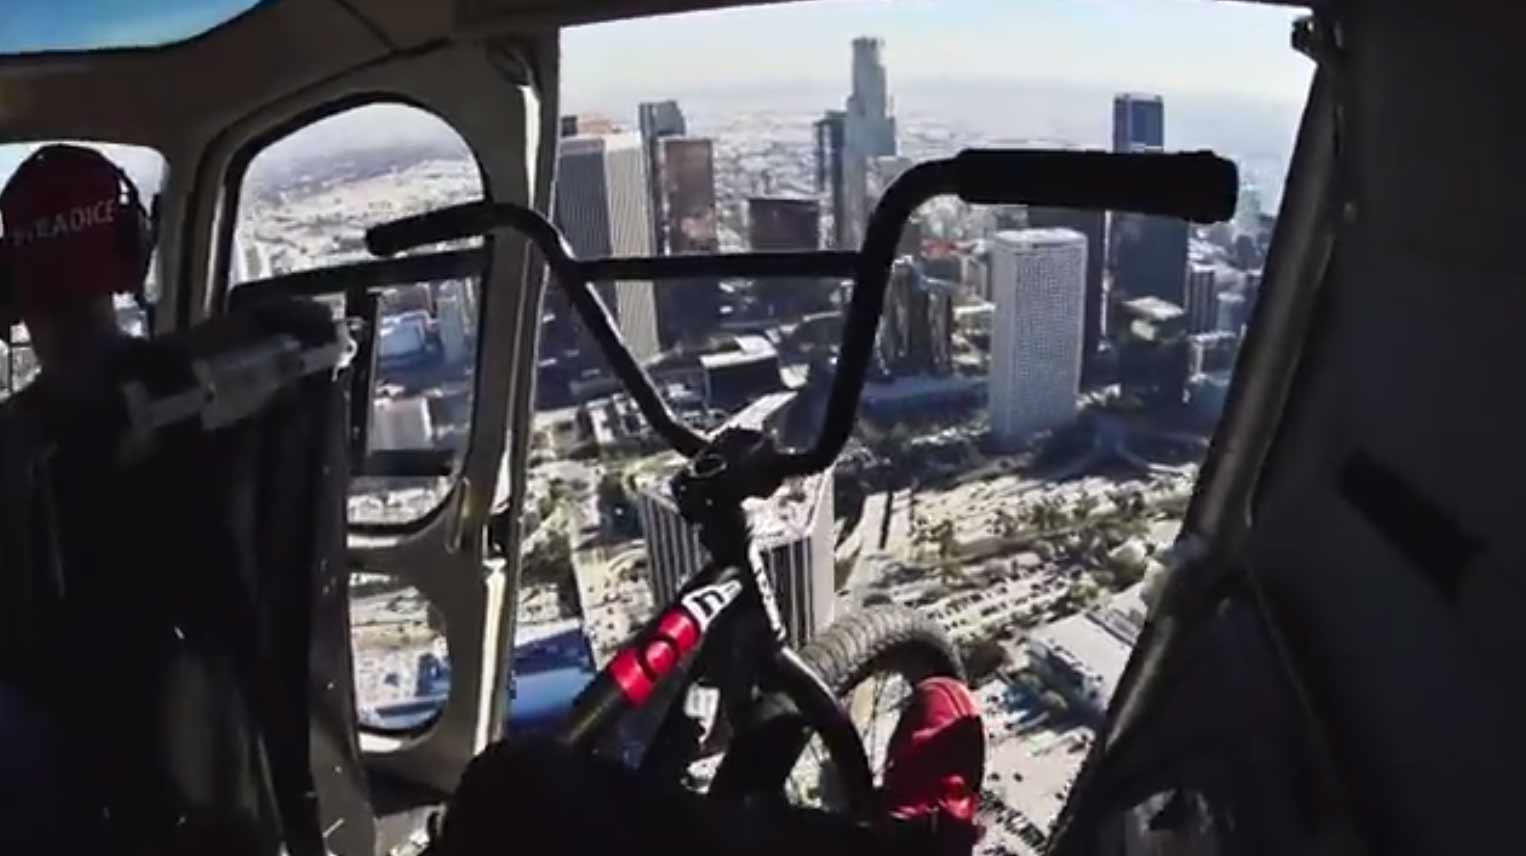 Crazy BMX Bike Ride Through Los Angeles With Nigel Sylvester